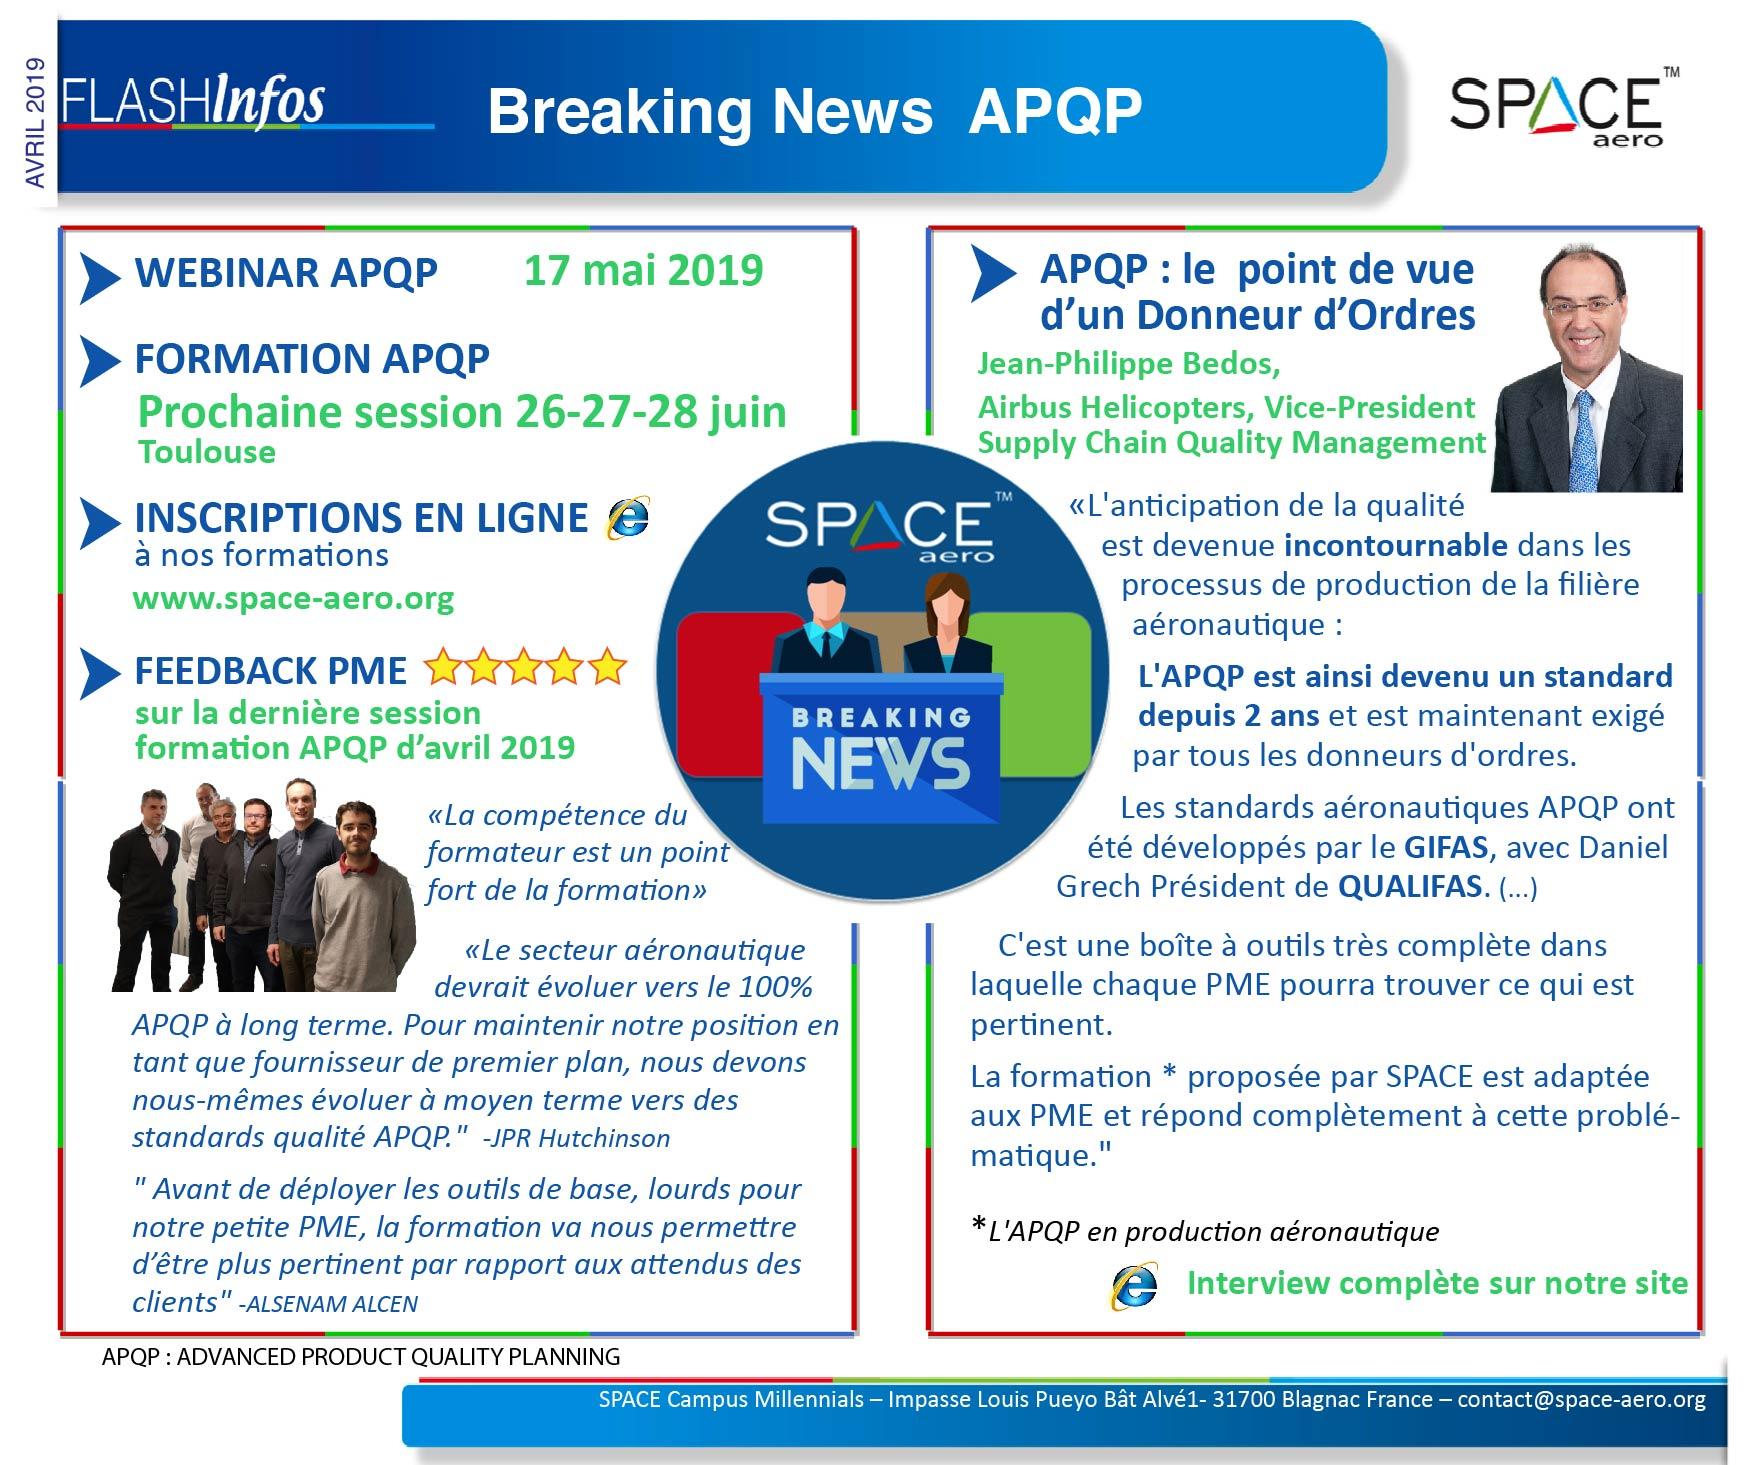 Flash Nr.54 : Breaking News – APQP